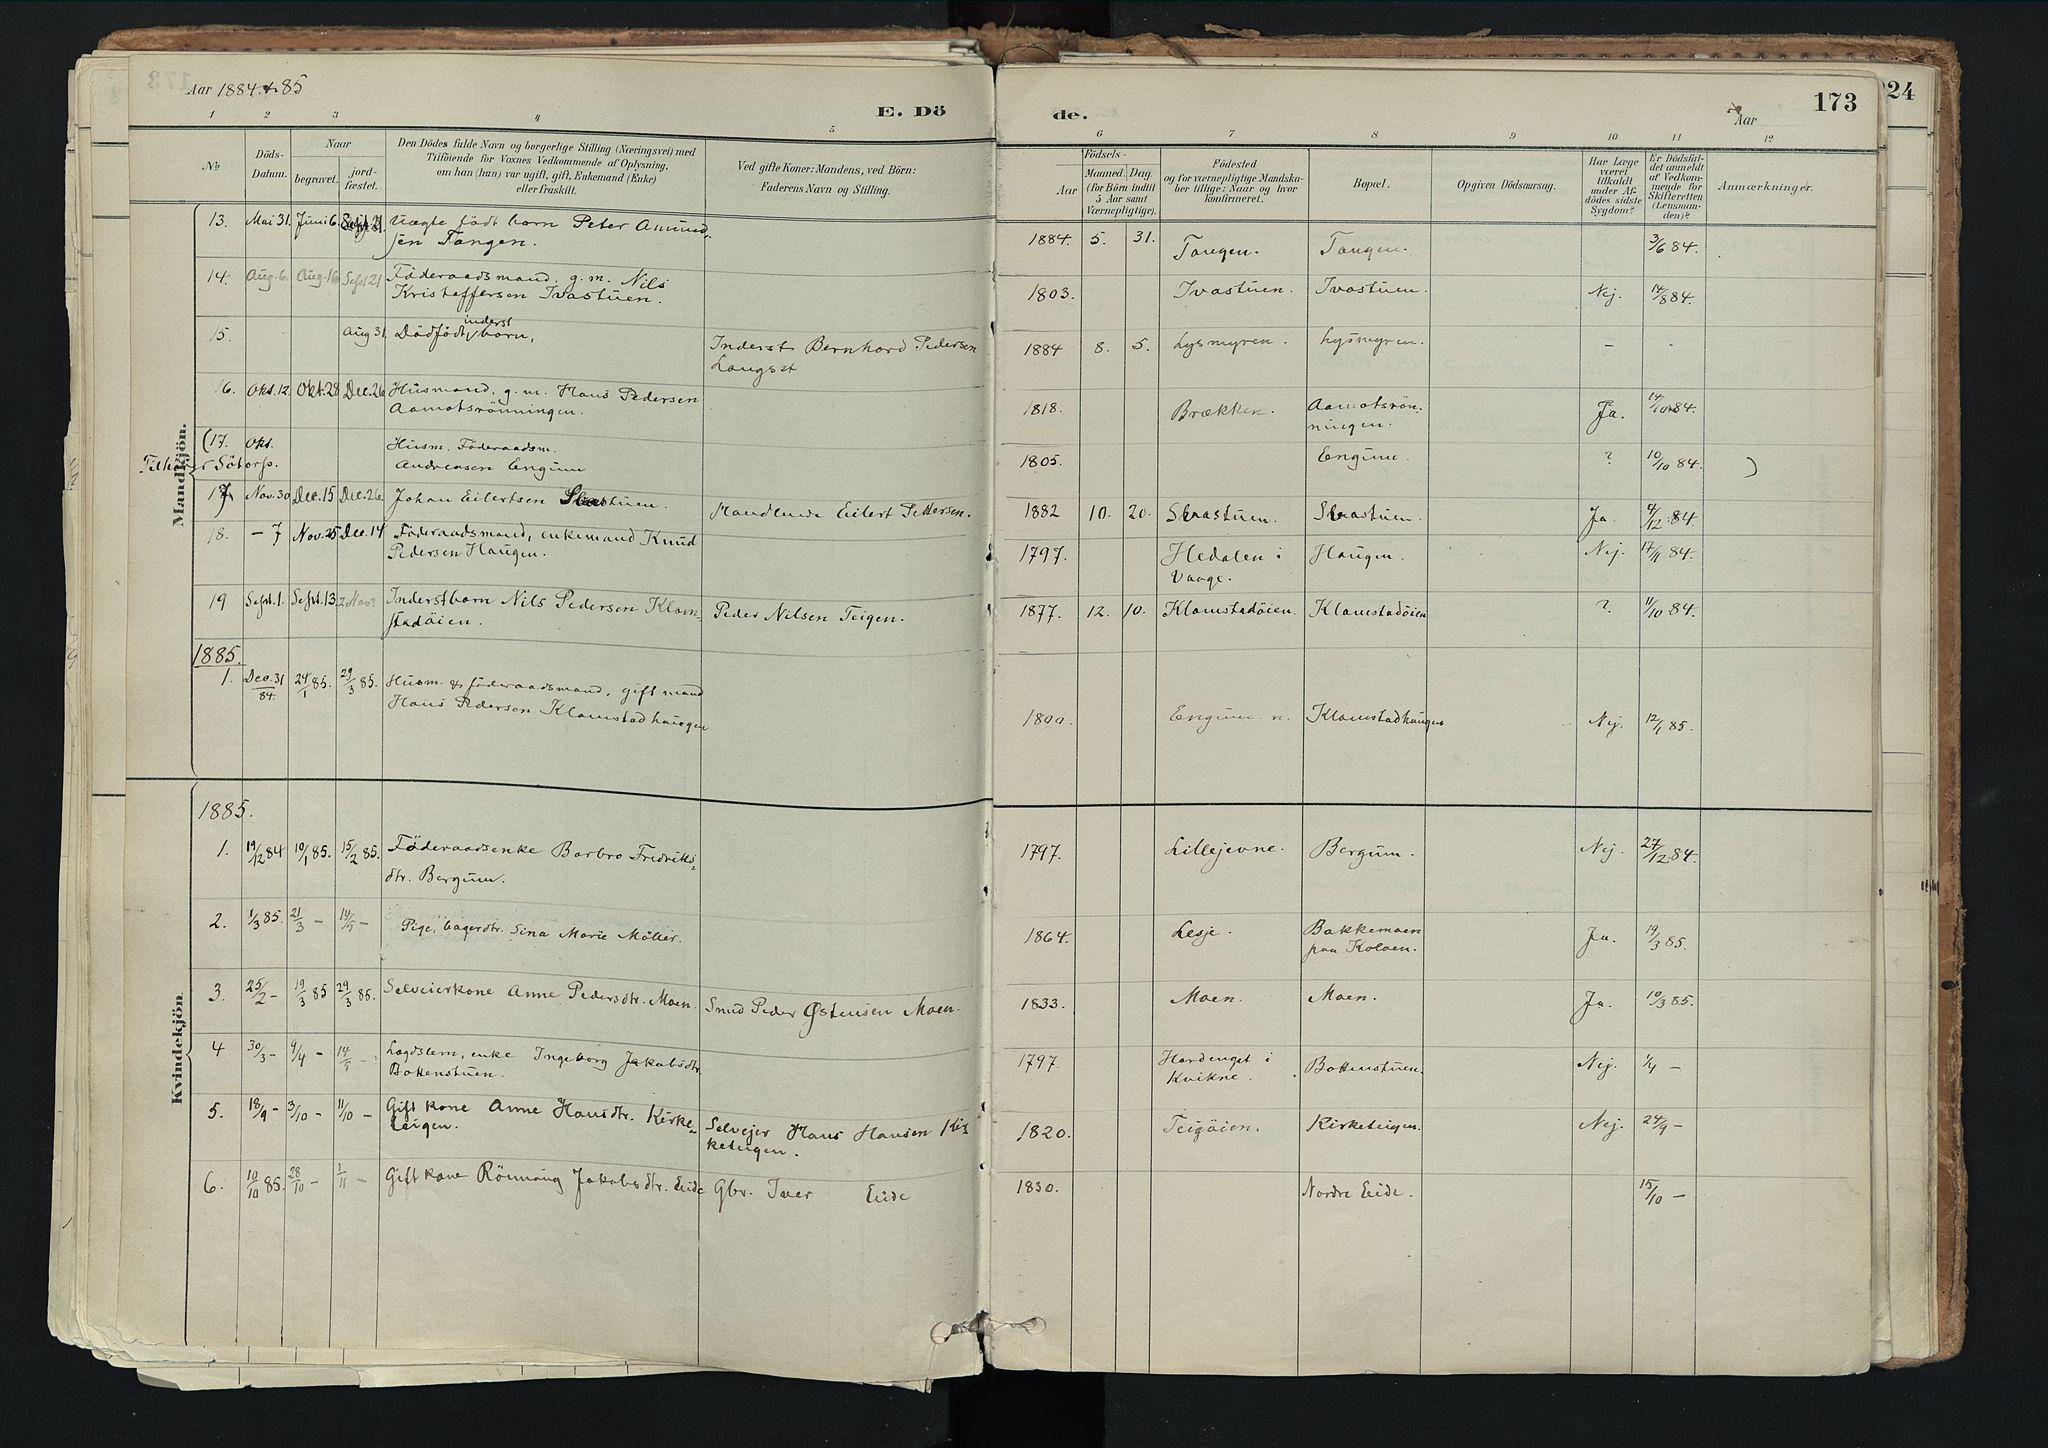 SAH, Nord-Fron prestekontor, Ministerialbok nr. 3, 1884-1914, s. 173